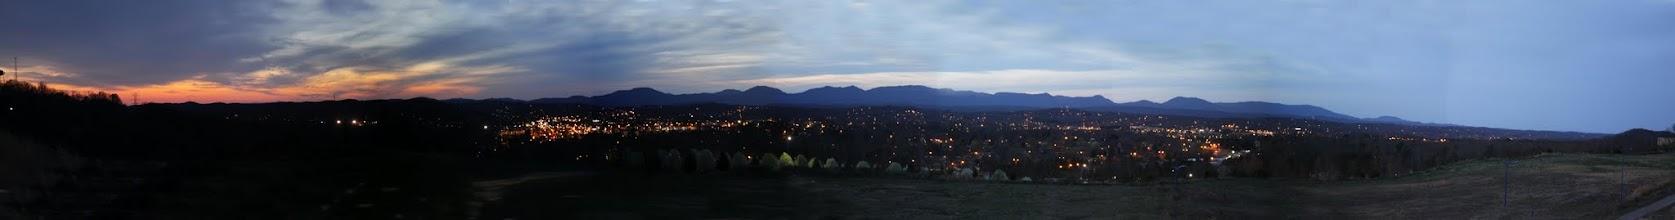 Photo: Oak Ridge at nightfall just after sunset from Oak Ridge Summit on Pine Ridge - 90 MM lens setting